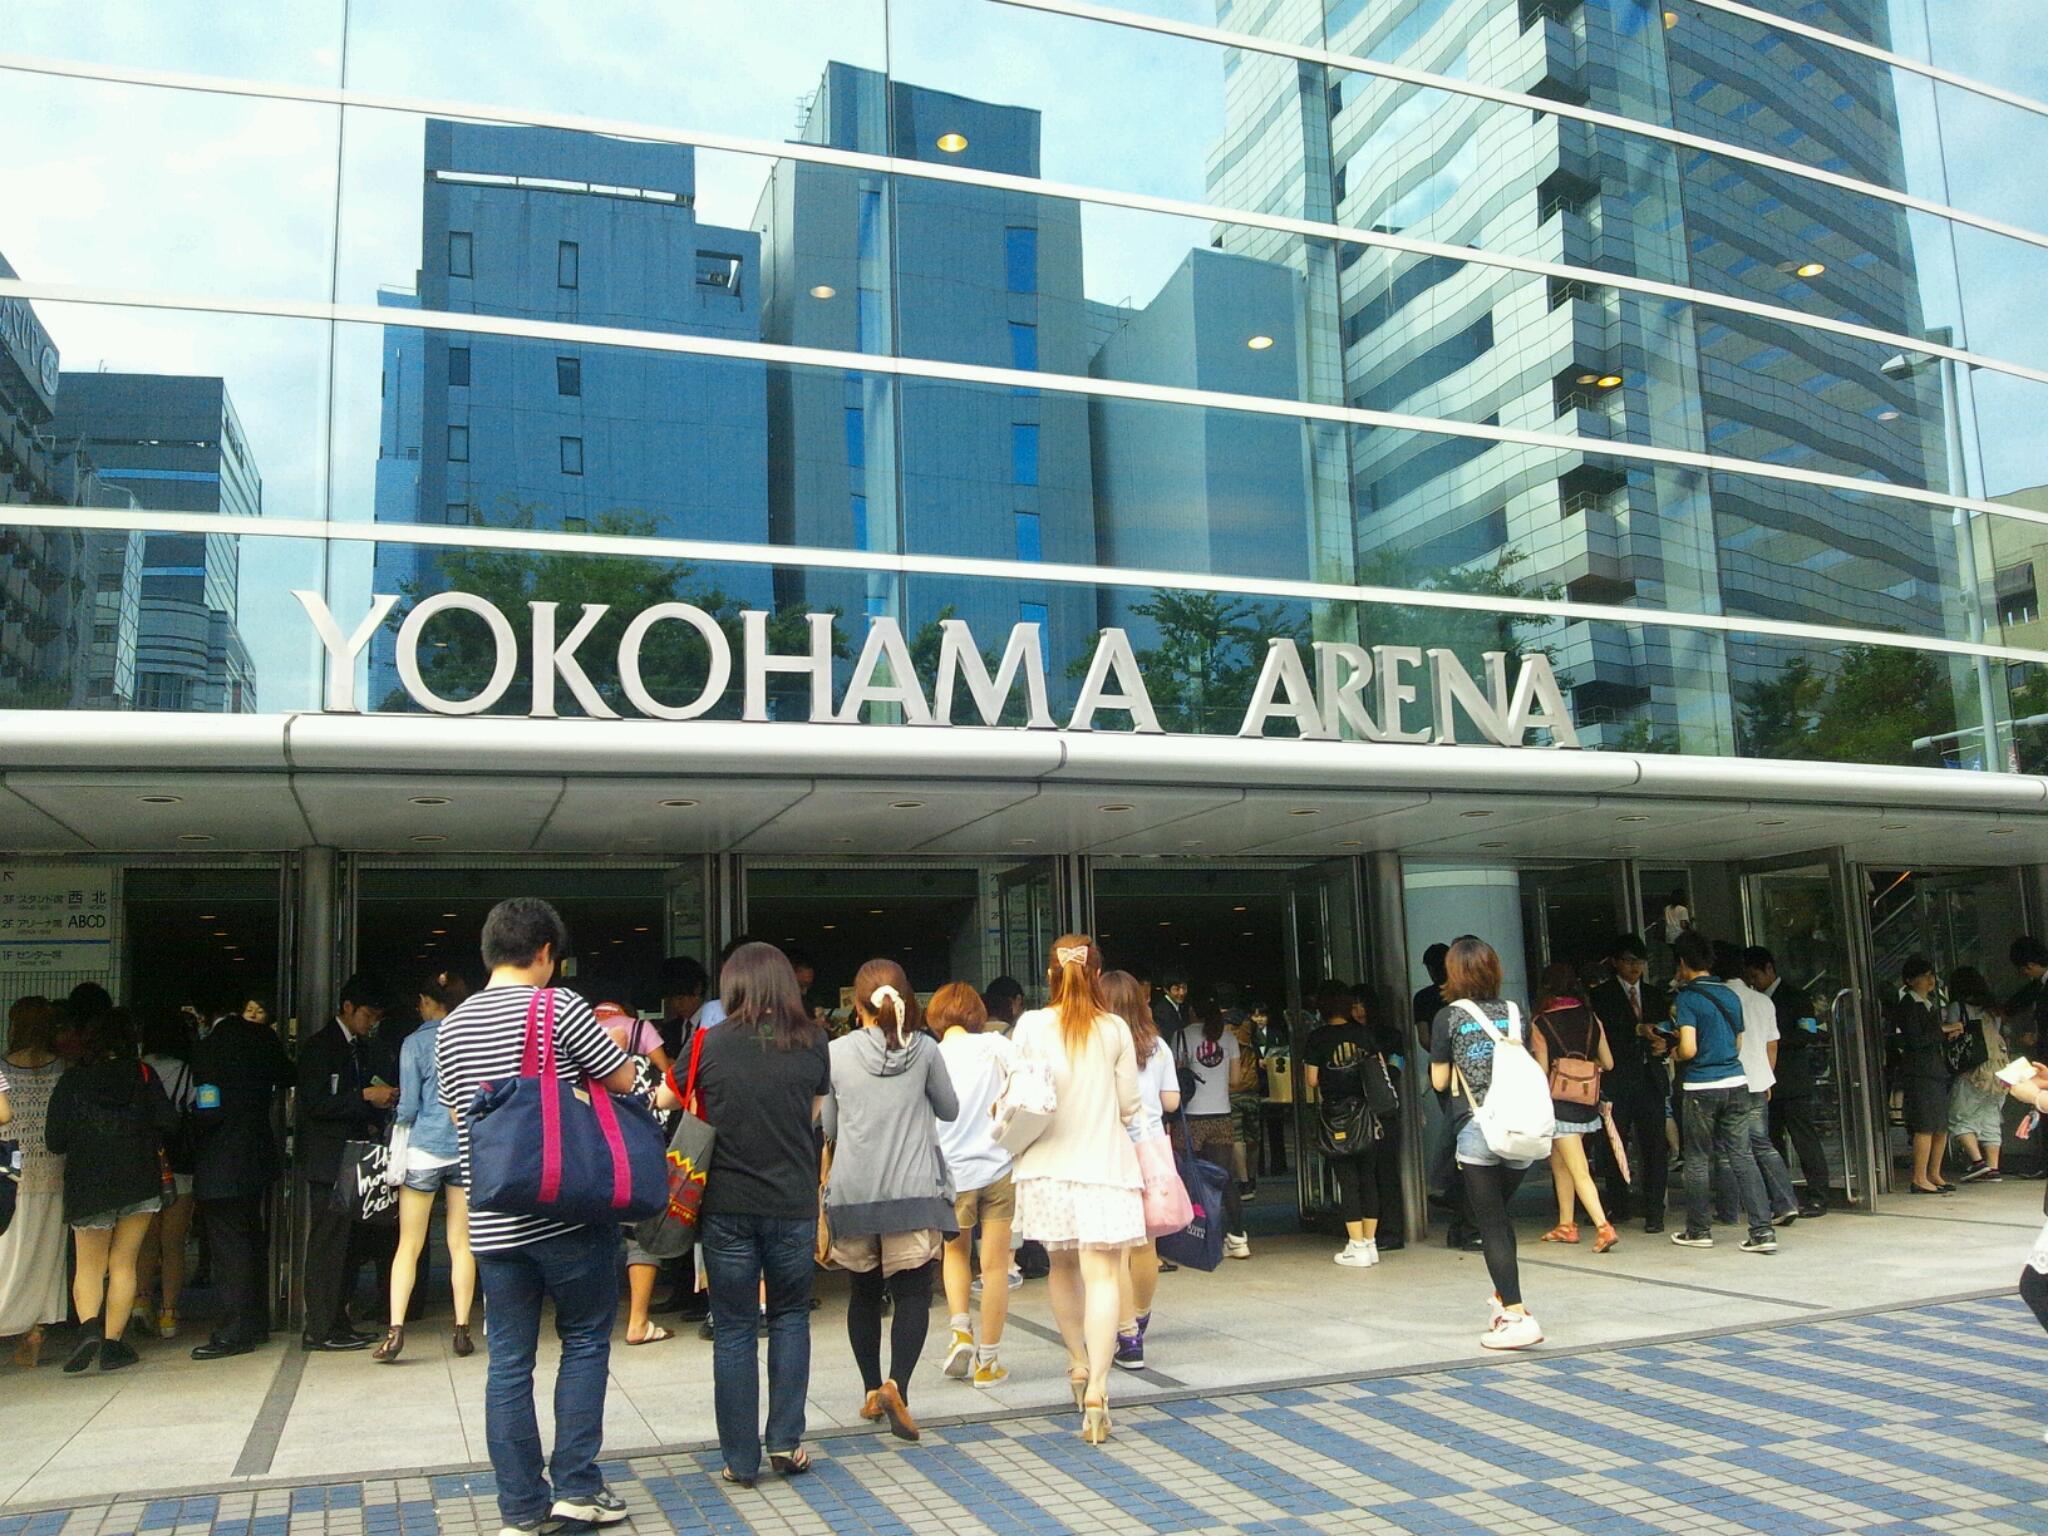 Yokohama Arena image8